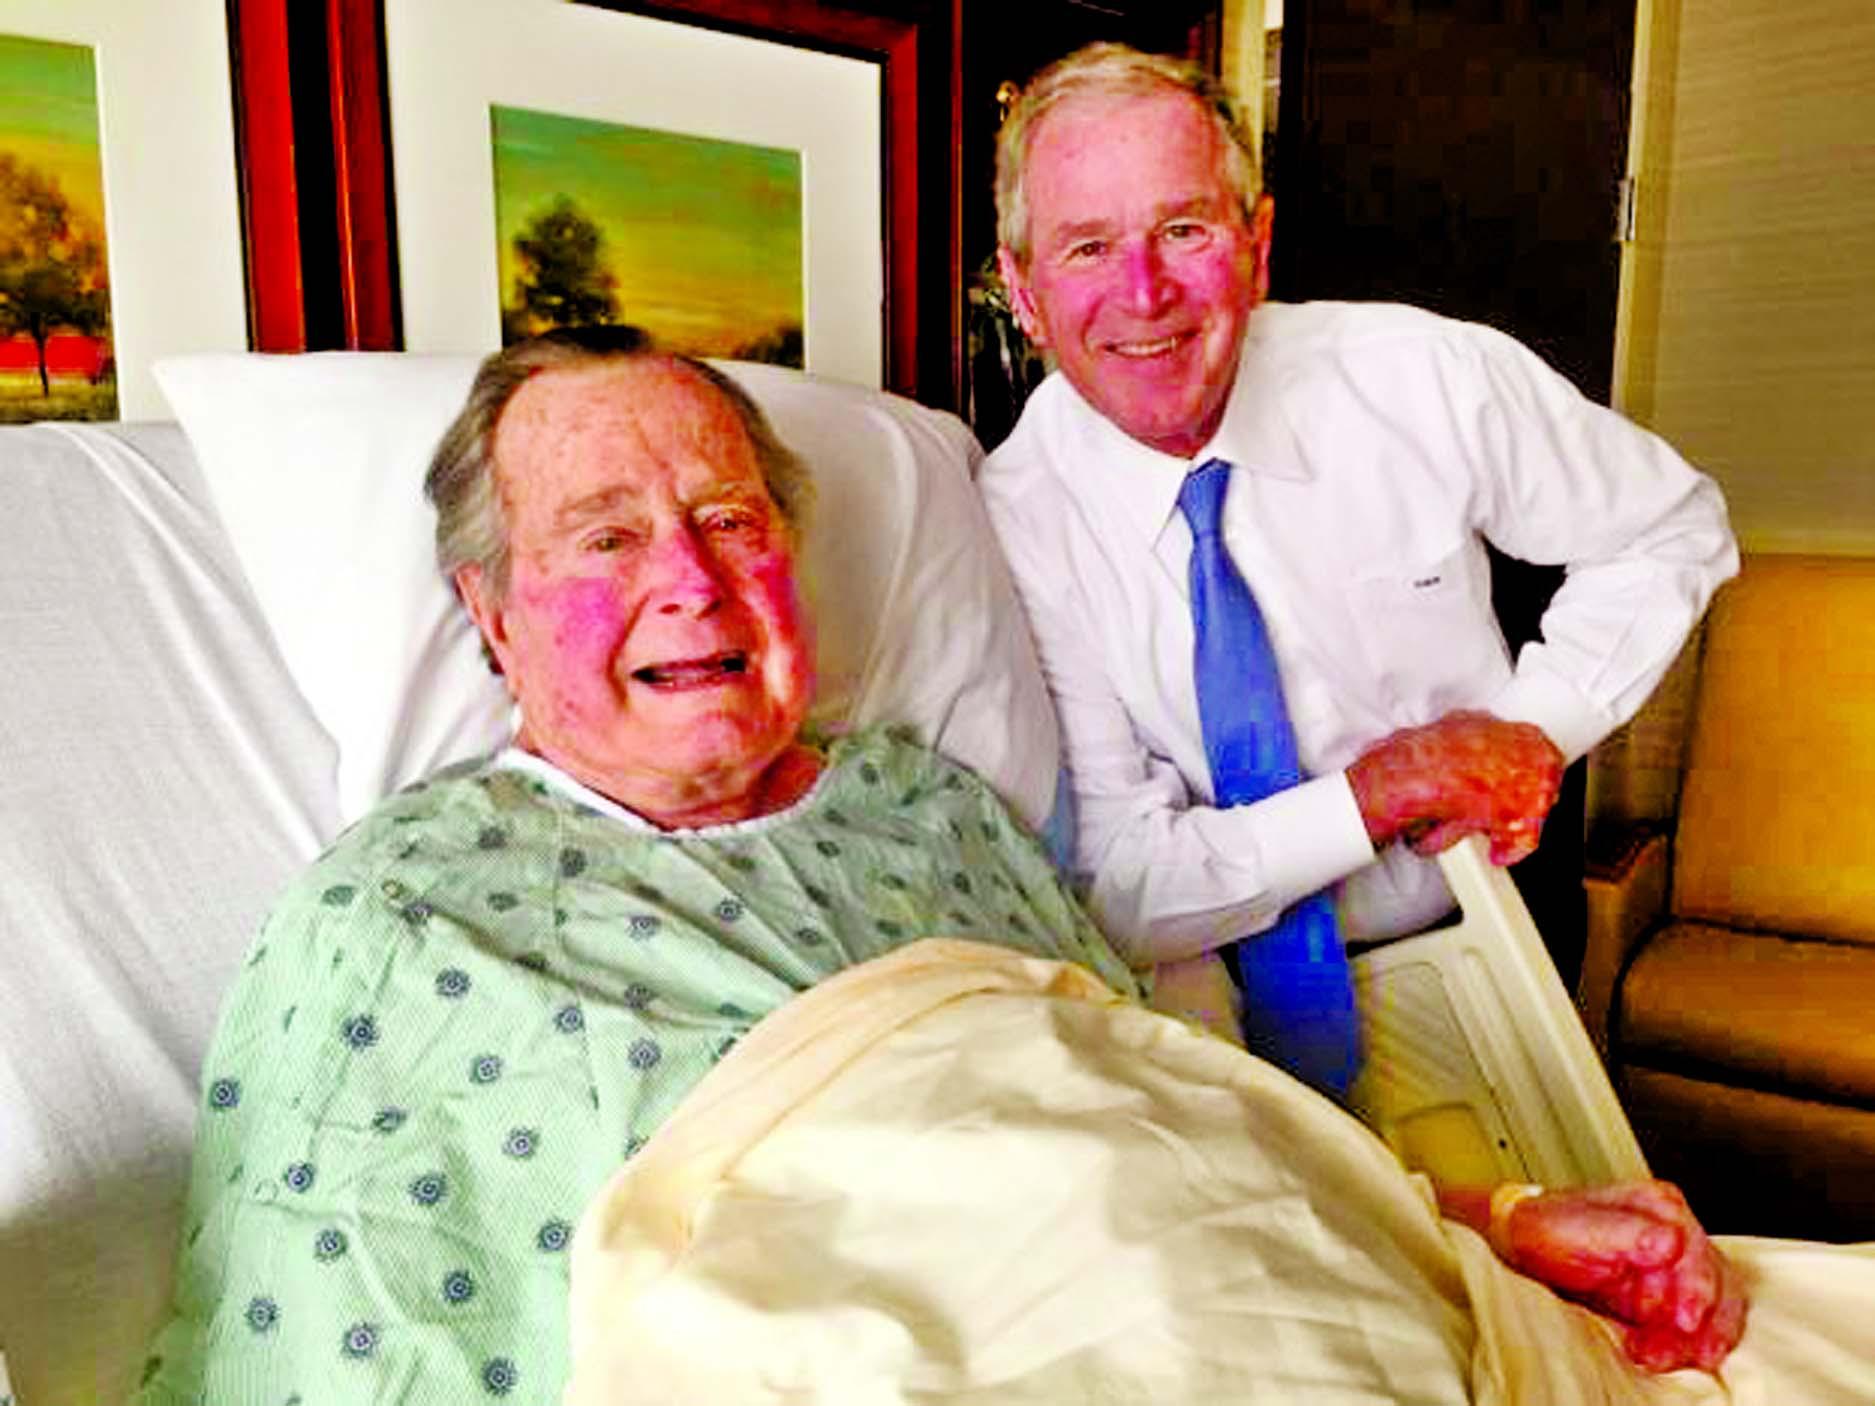 Ex-US President George H.W. Bush staying in hospital few more days